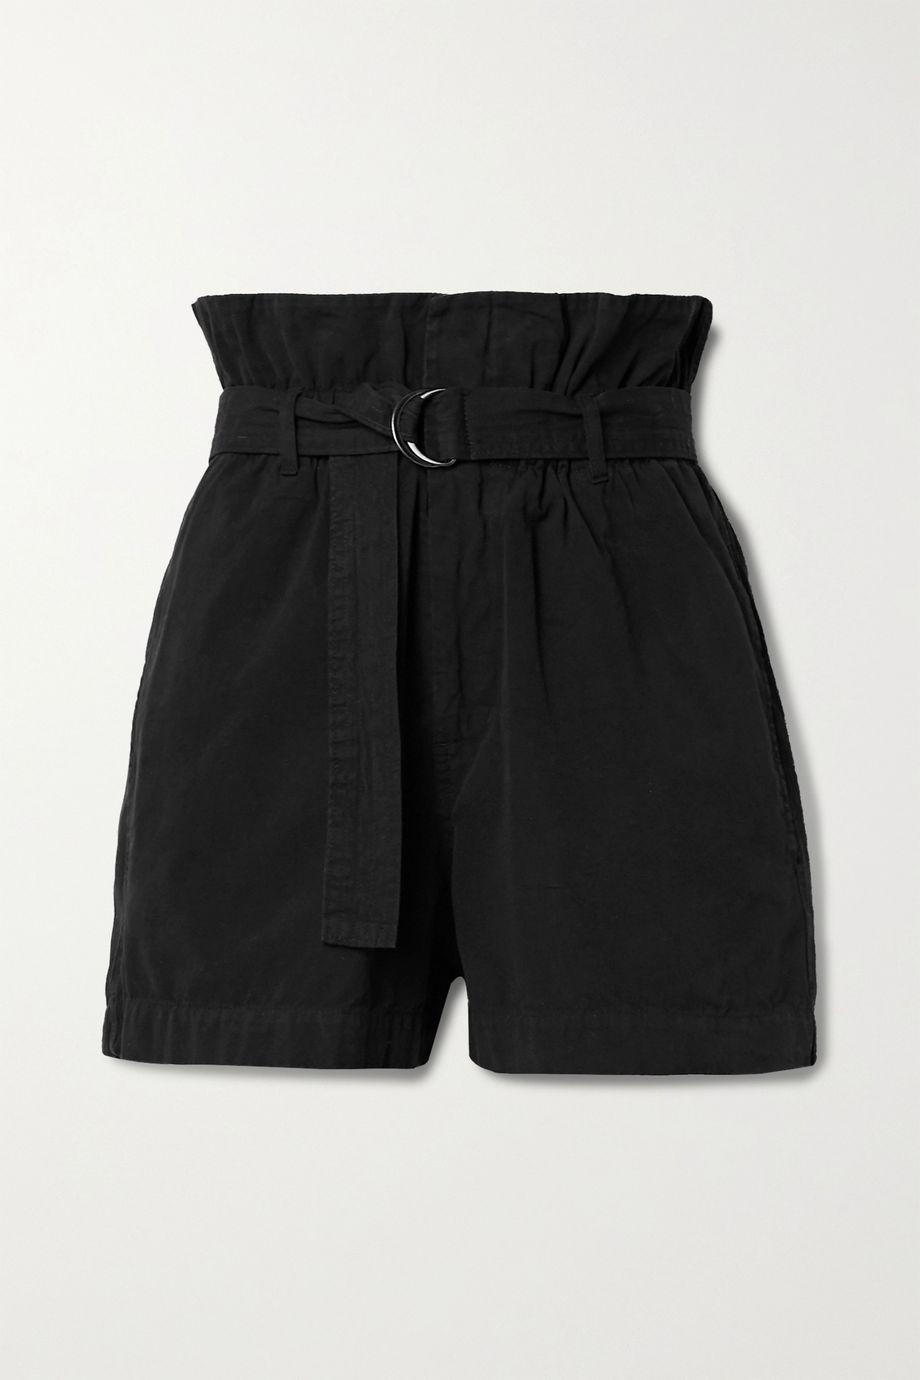 Bassike 配腰带纯棉帆布短裤